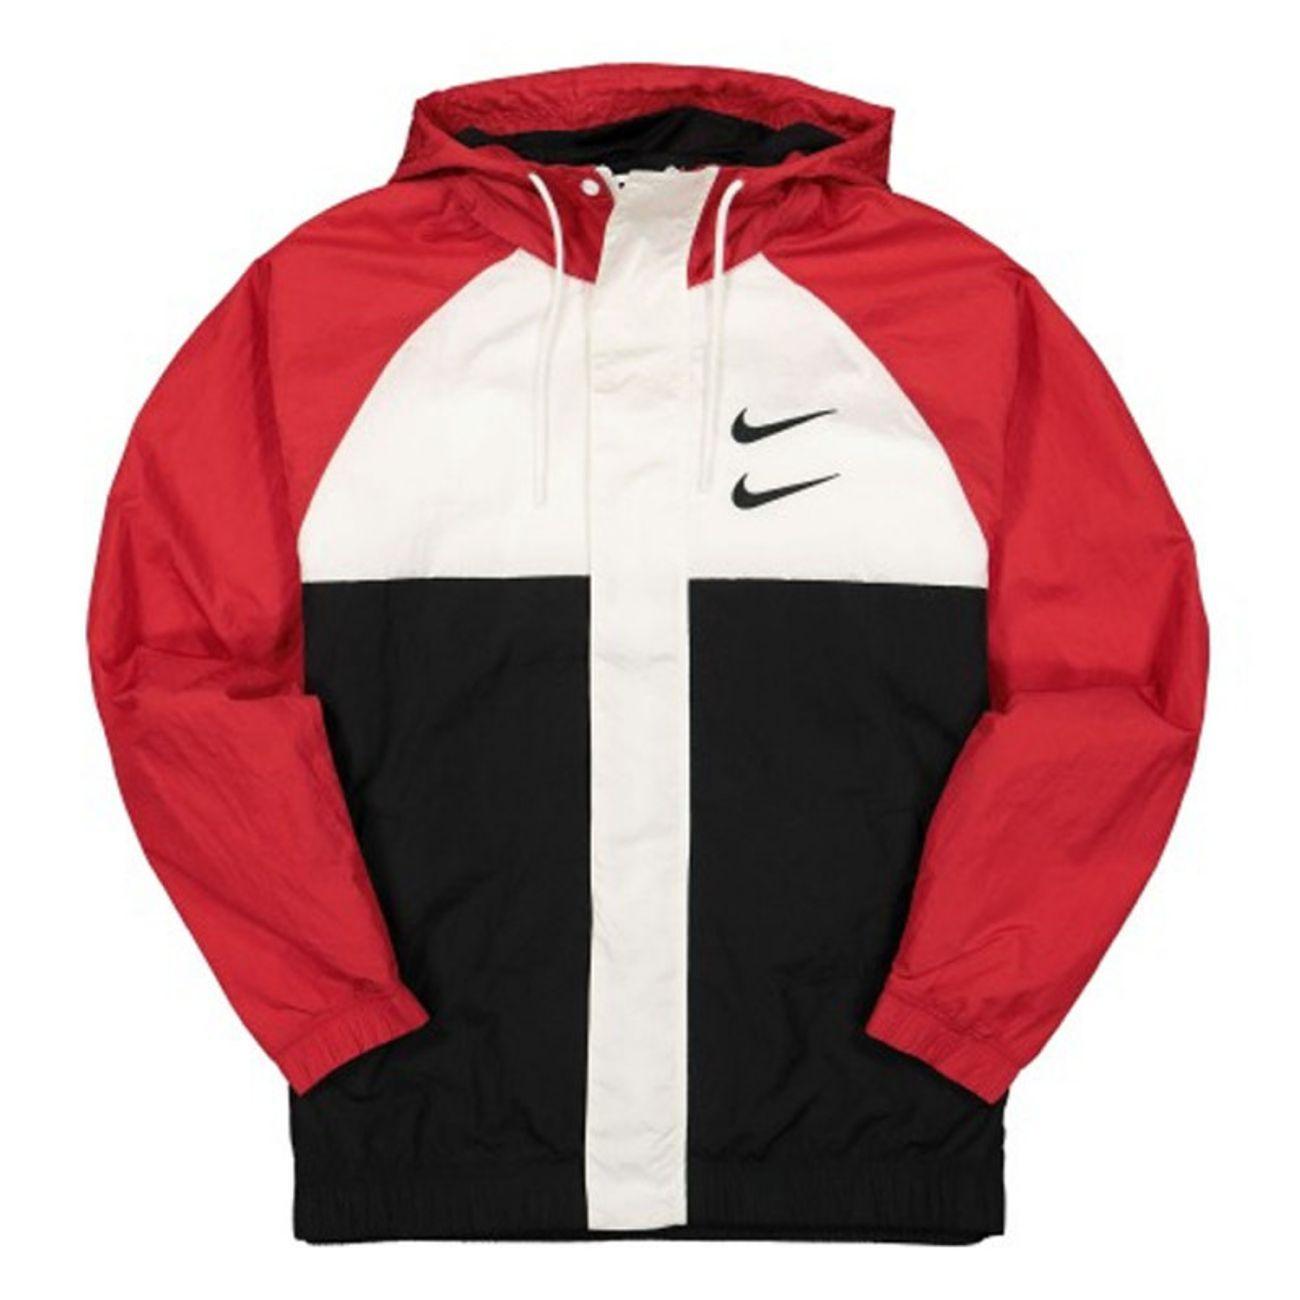 mode adulte NIKE Veste Tissée À Capuche Nike Sportswear Swoosh